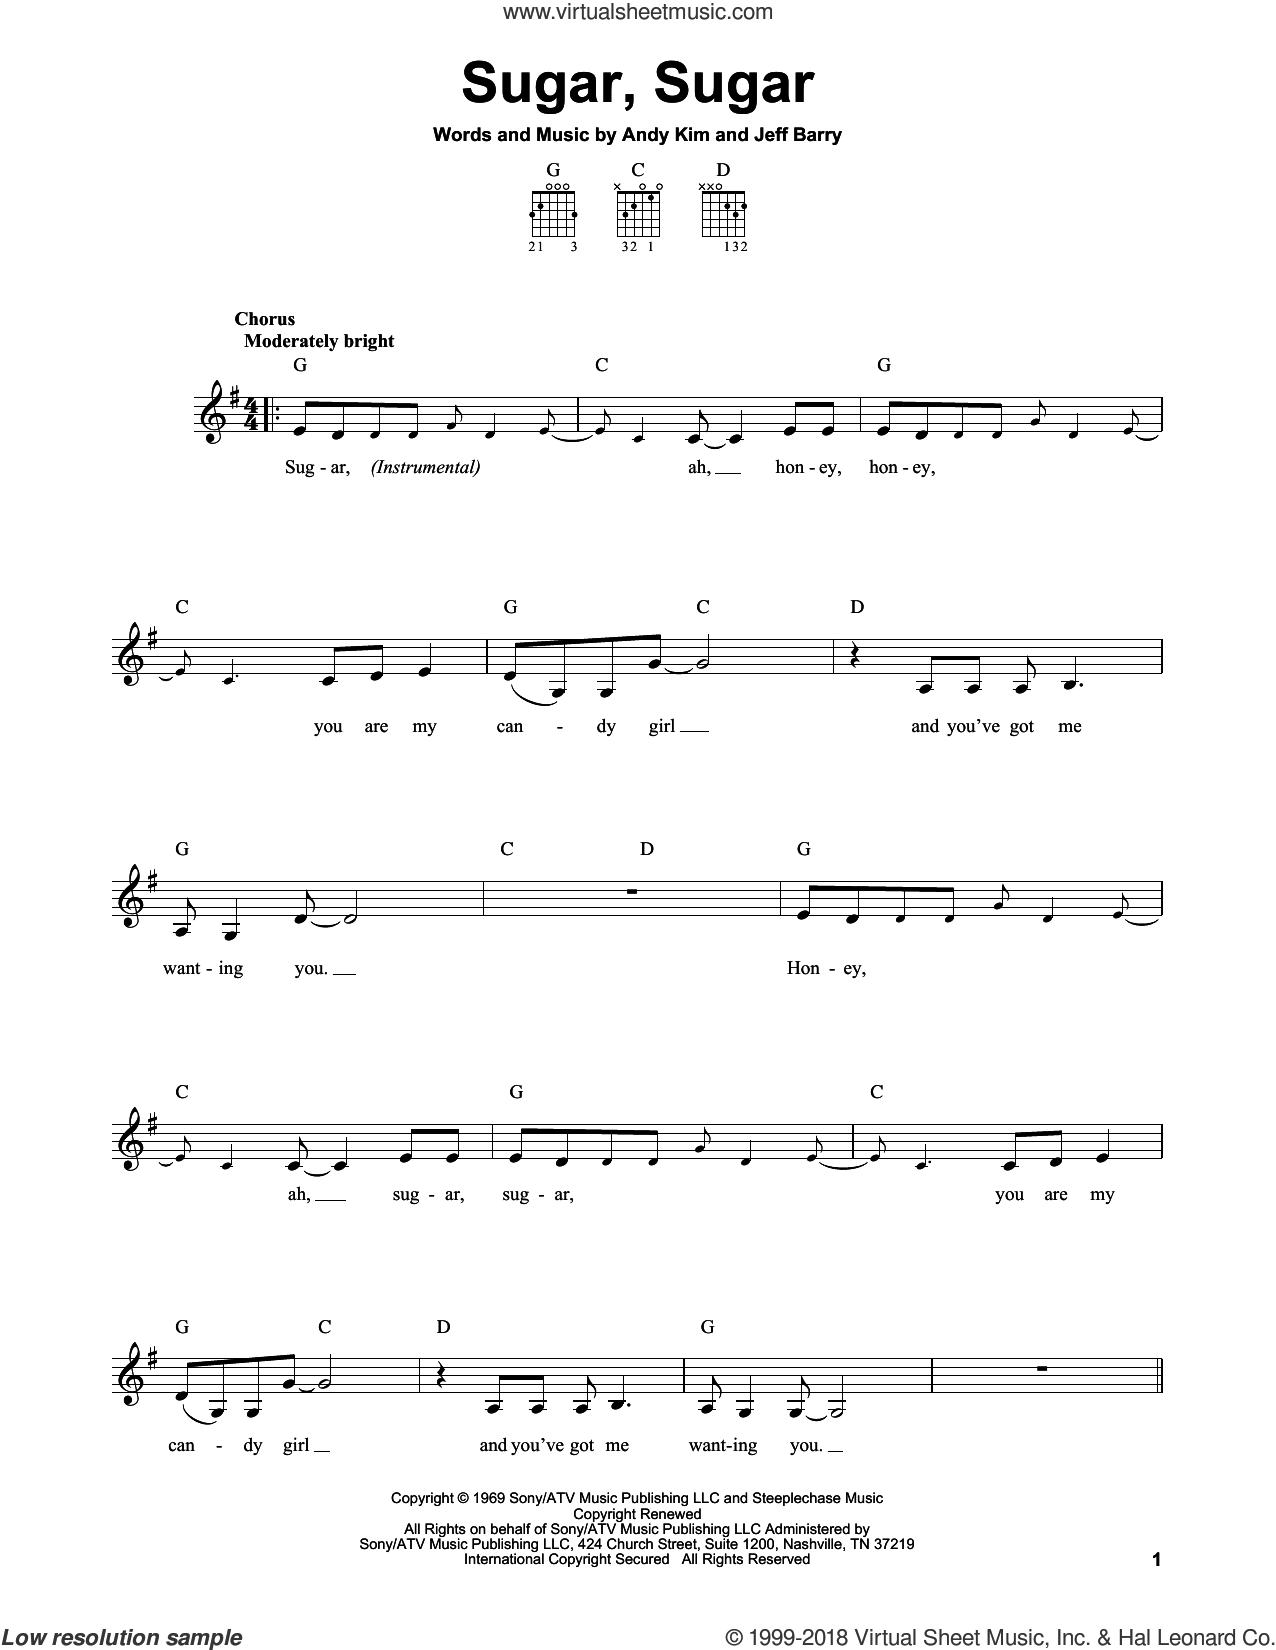 Sugar Sugar Guitar Chords